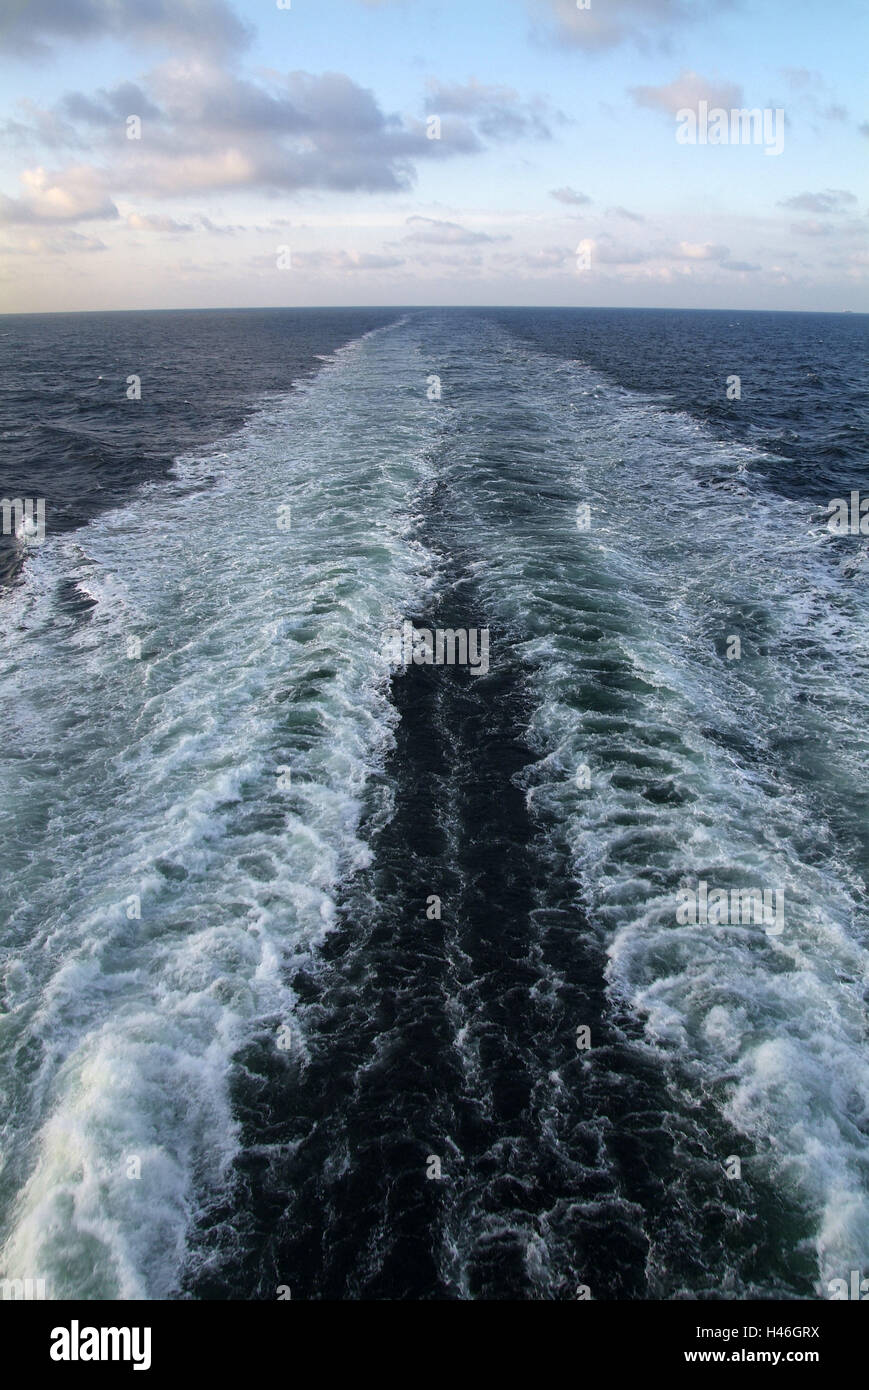 Ship, stern, sea, wake, Stock Photo